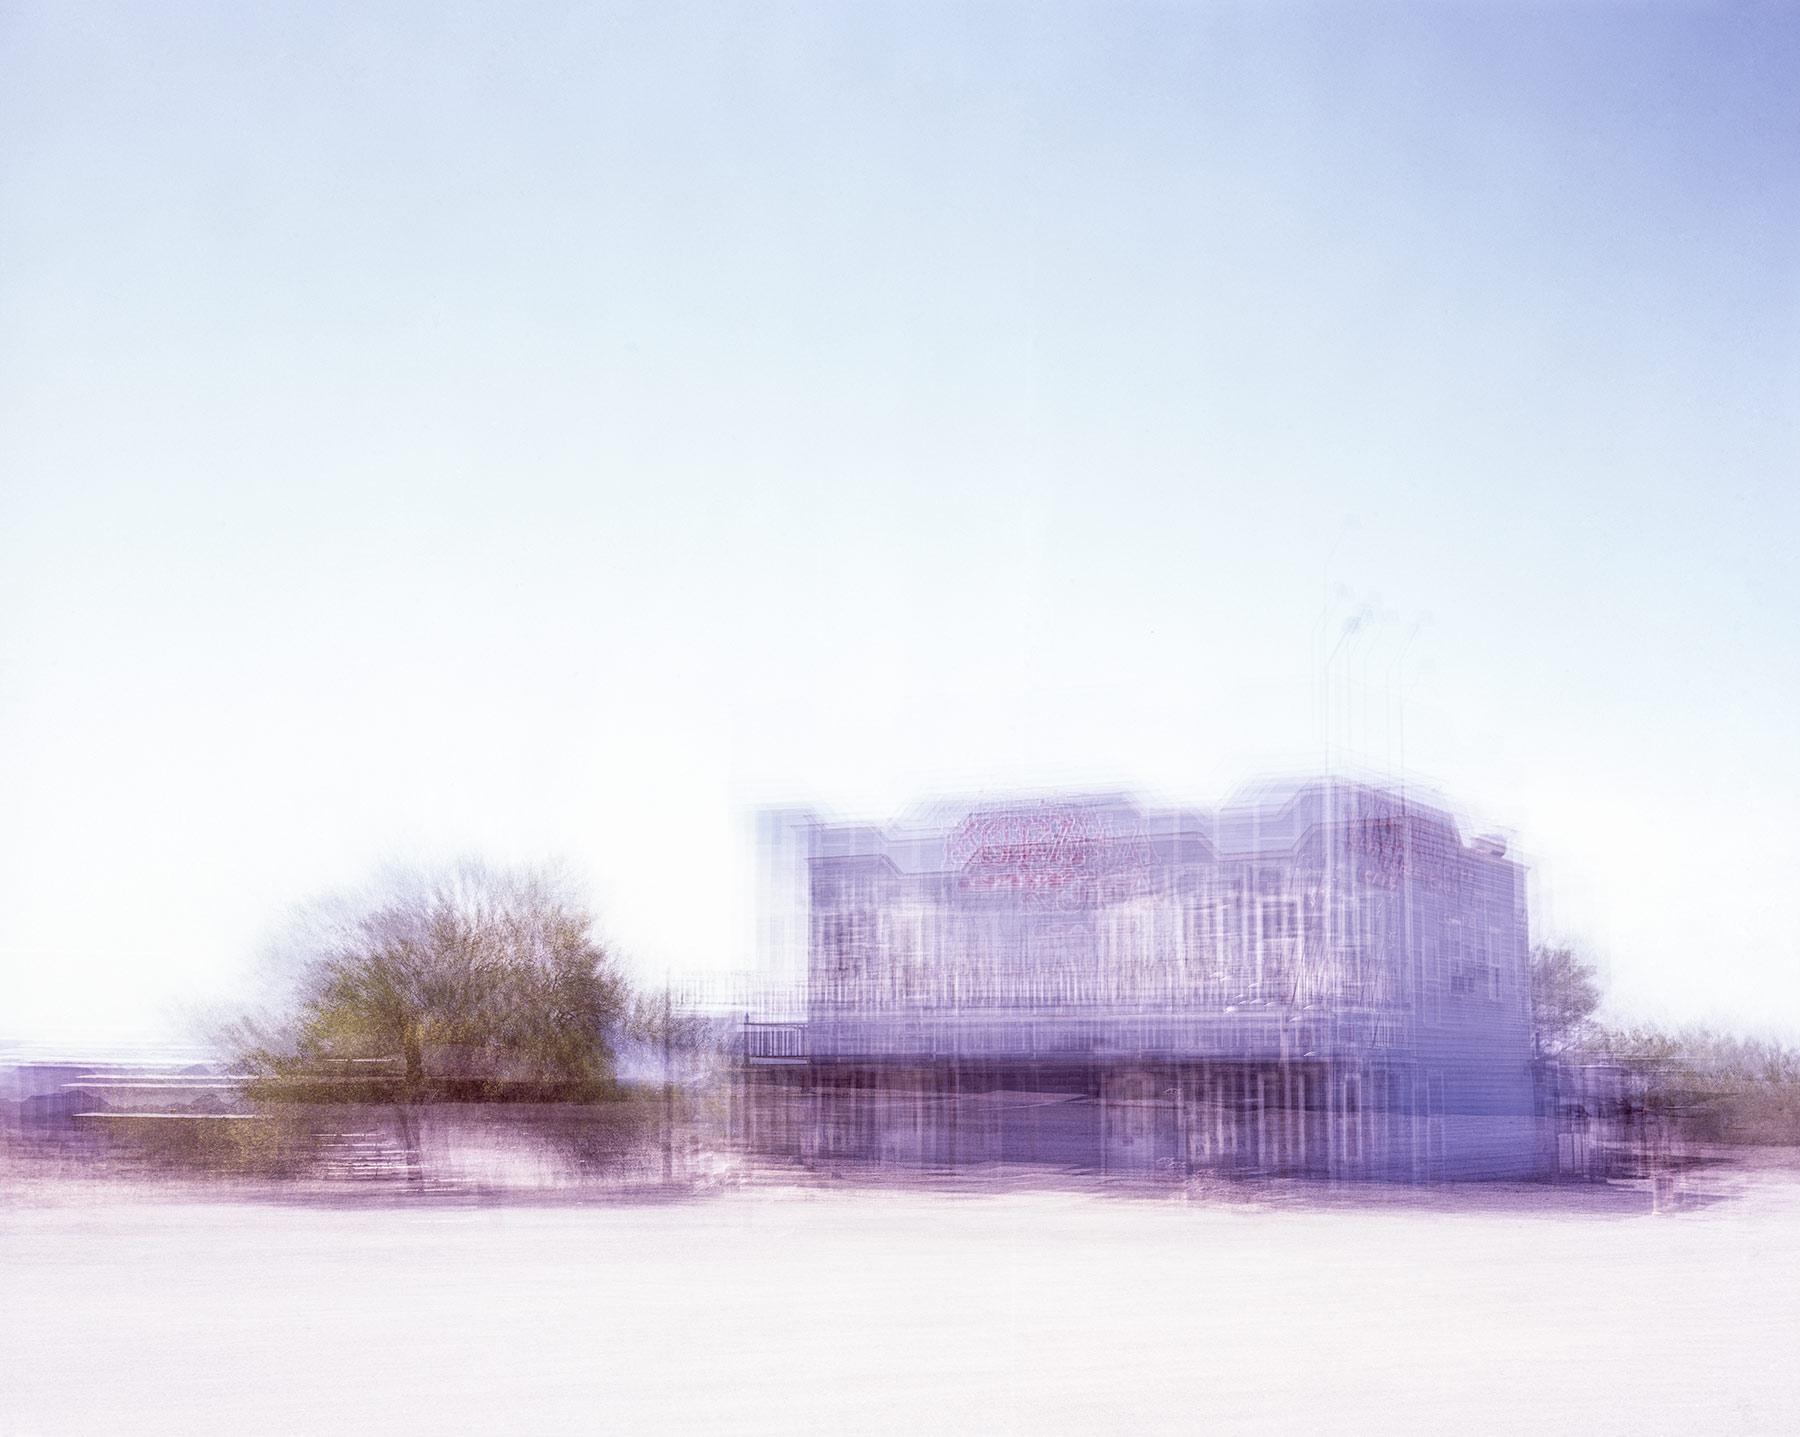 vicksburg road crossing. arizona